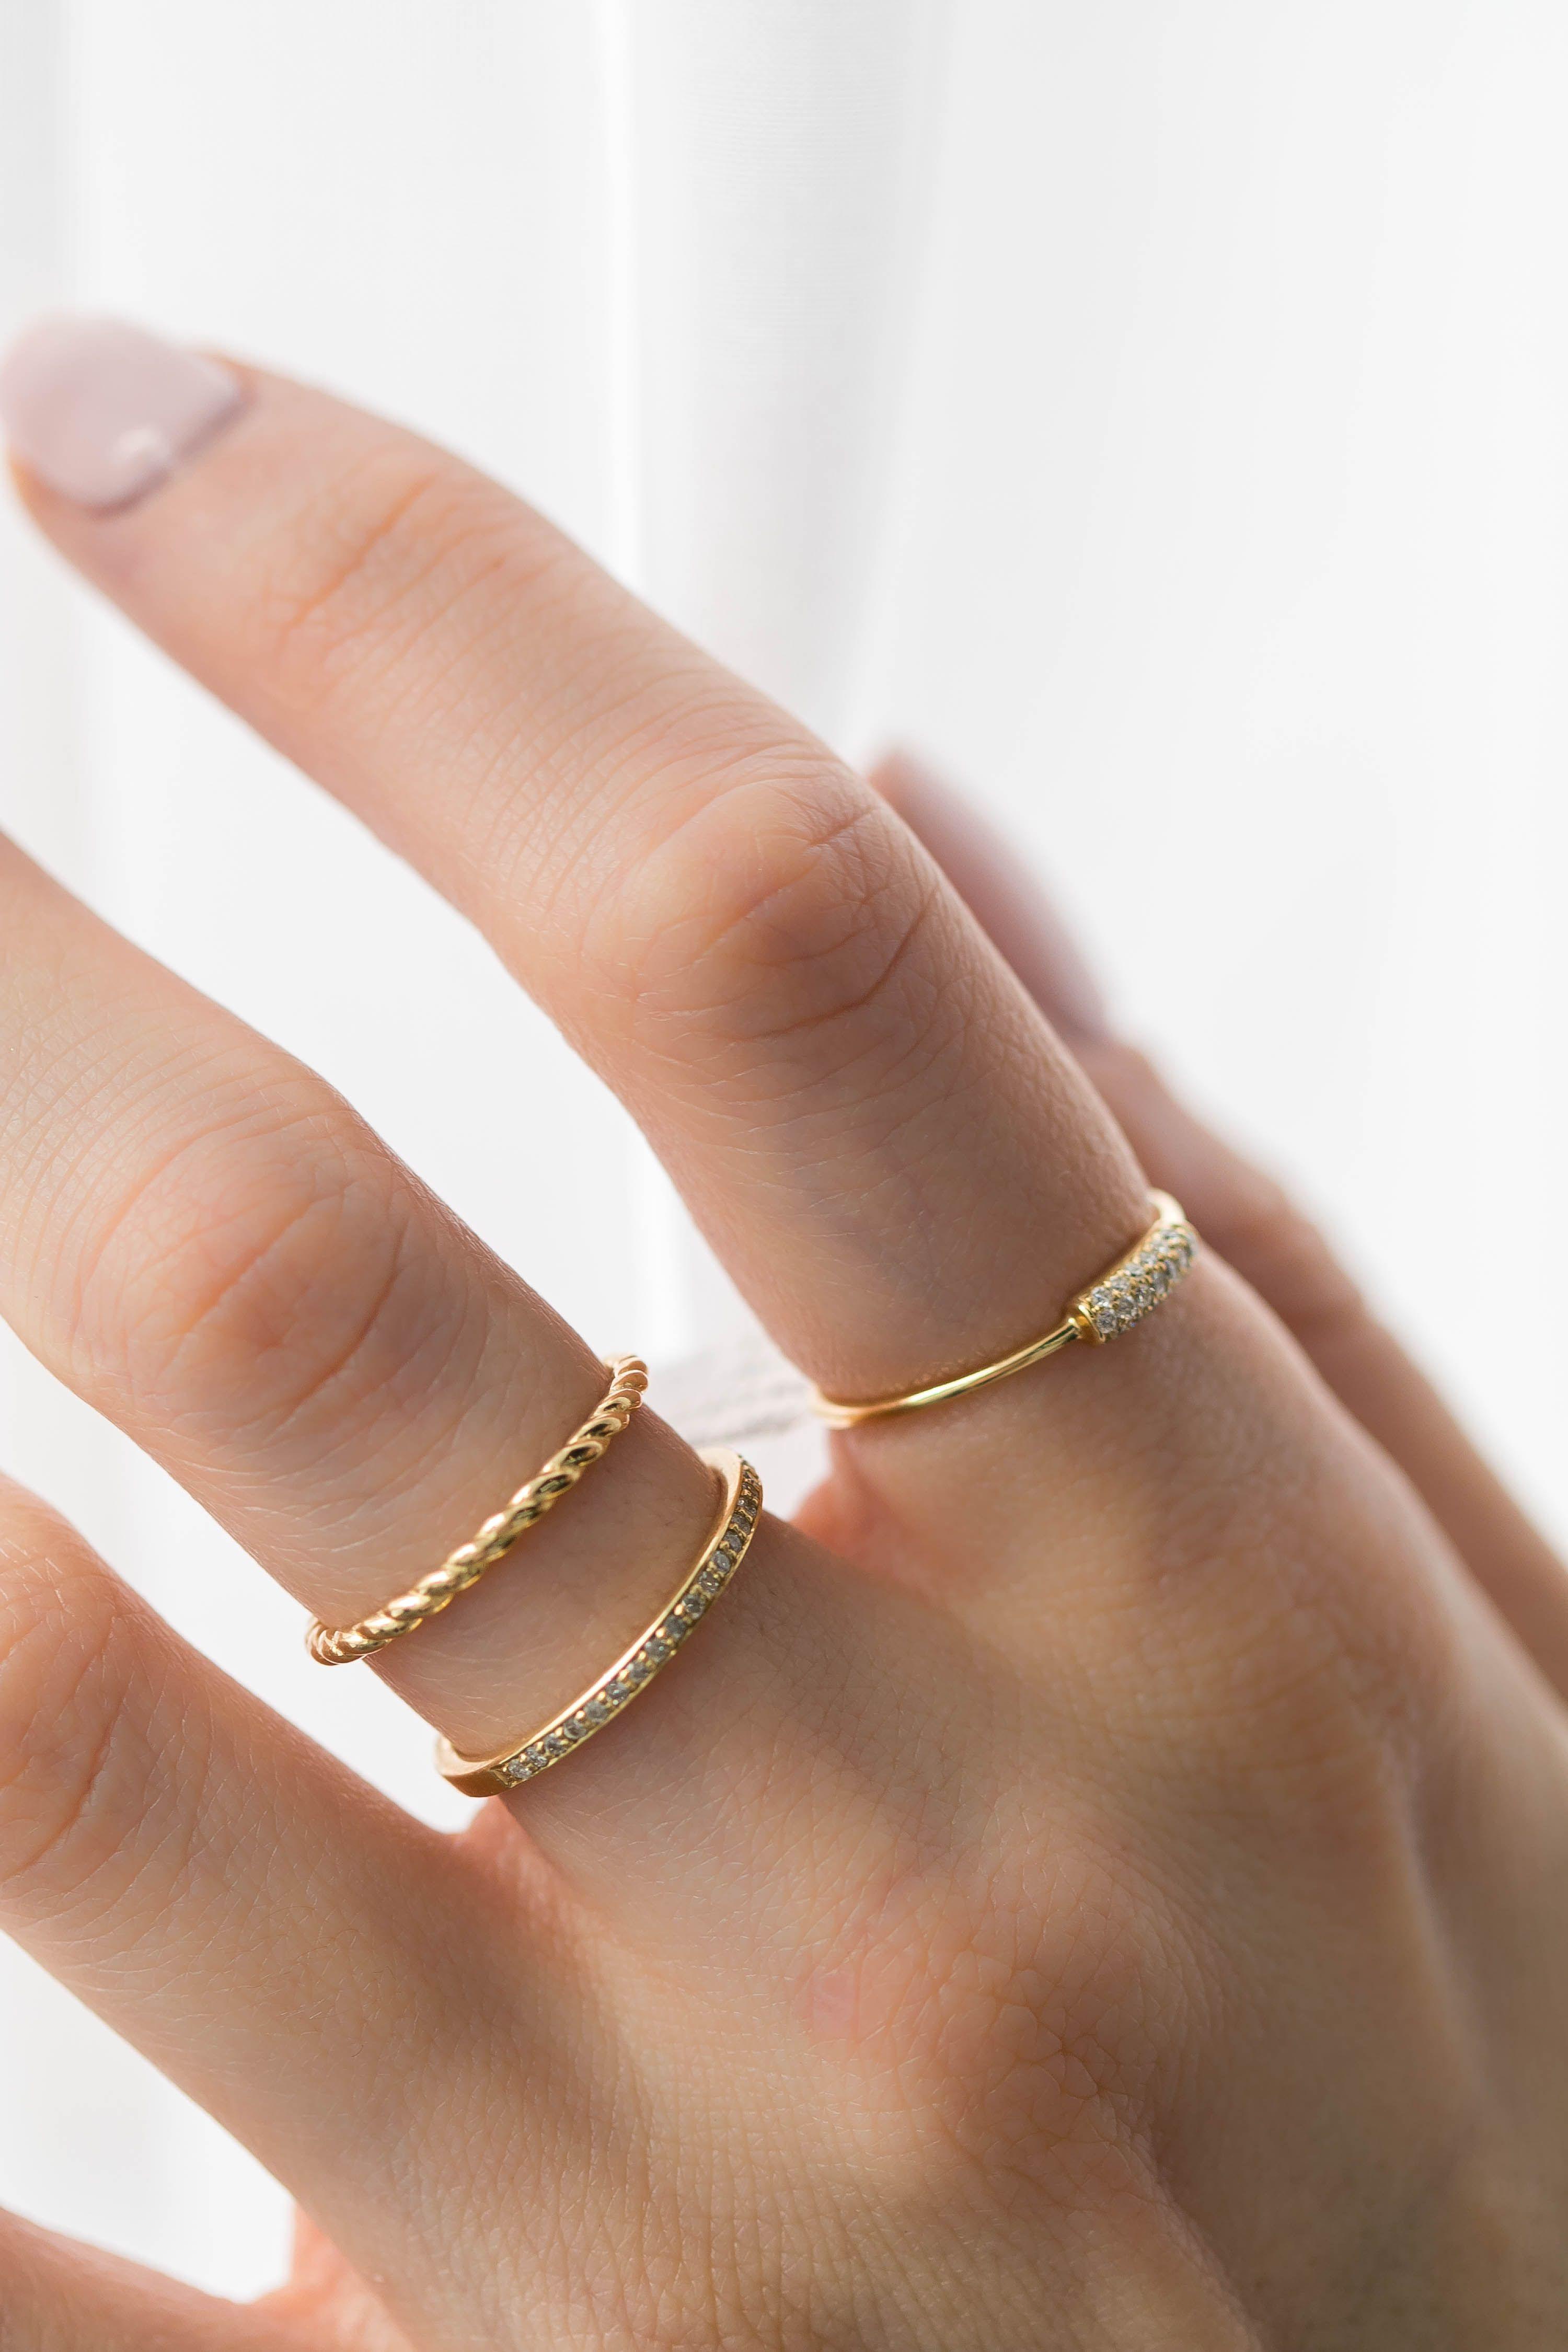 Braided Rope Classic Wedding Band Ring In 14k Yellow Gold Md180604 Rose Gold Black Diamond Rose Gold Diamond Band Amazing Wedding Rings